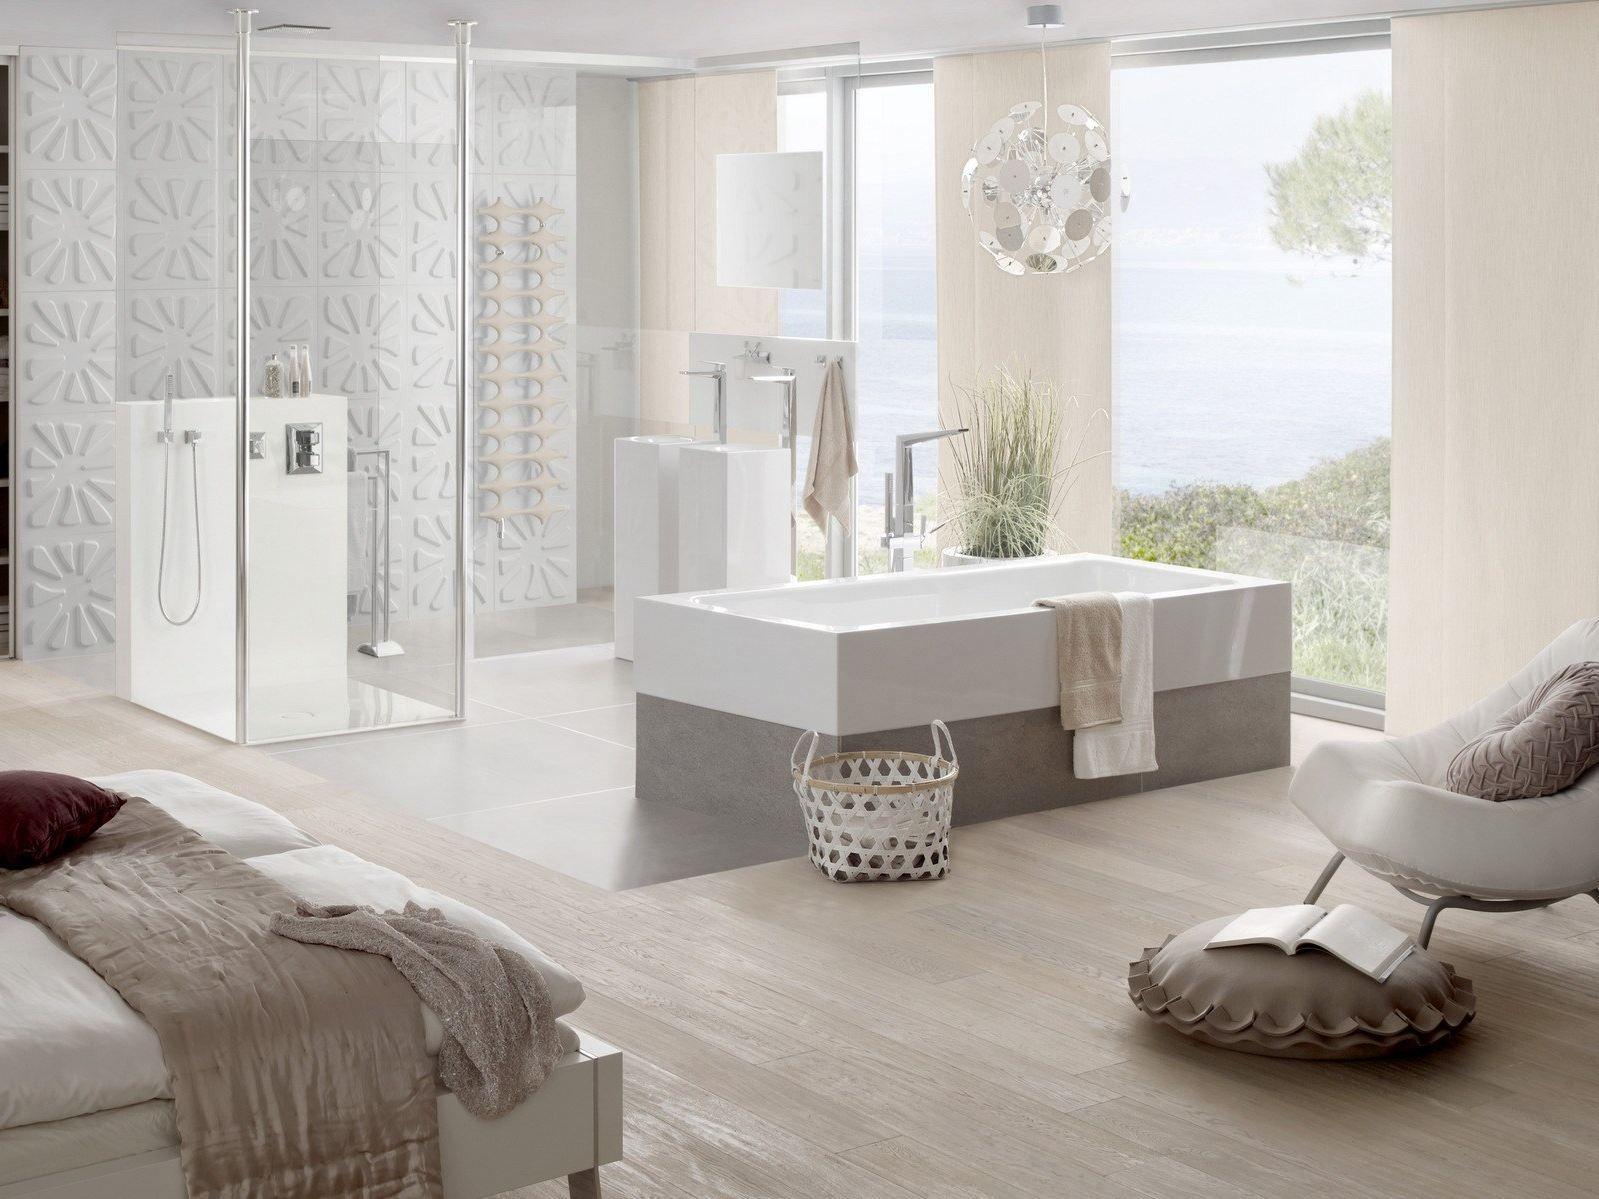 Vasca da bagno a semincasso BETTEONE HIGHLINE by Bette design Tesseraux + Par...